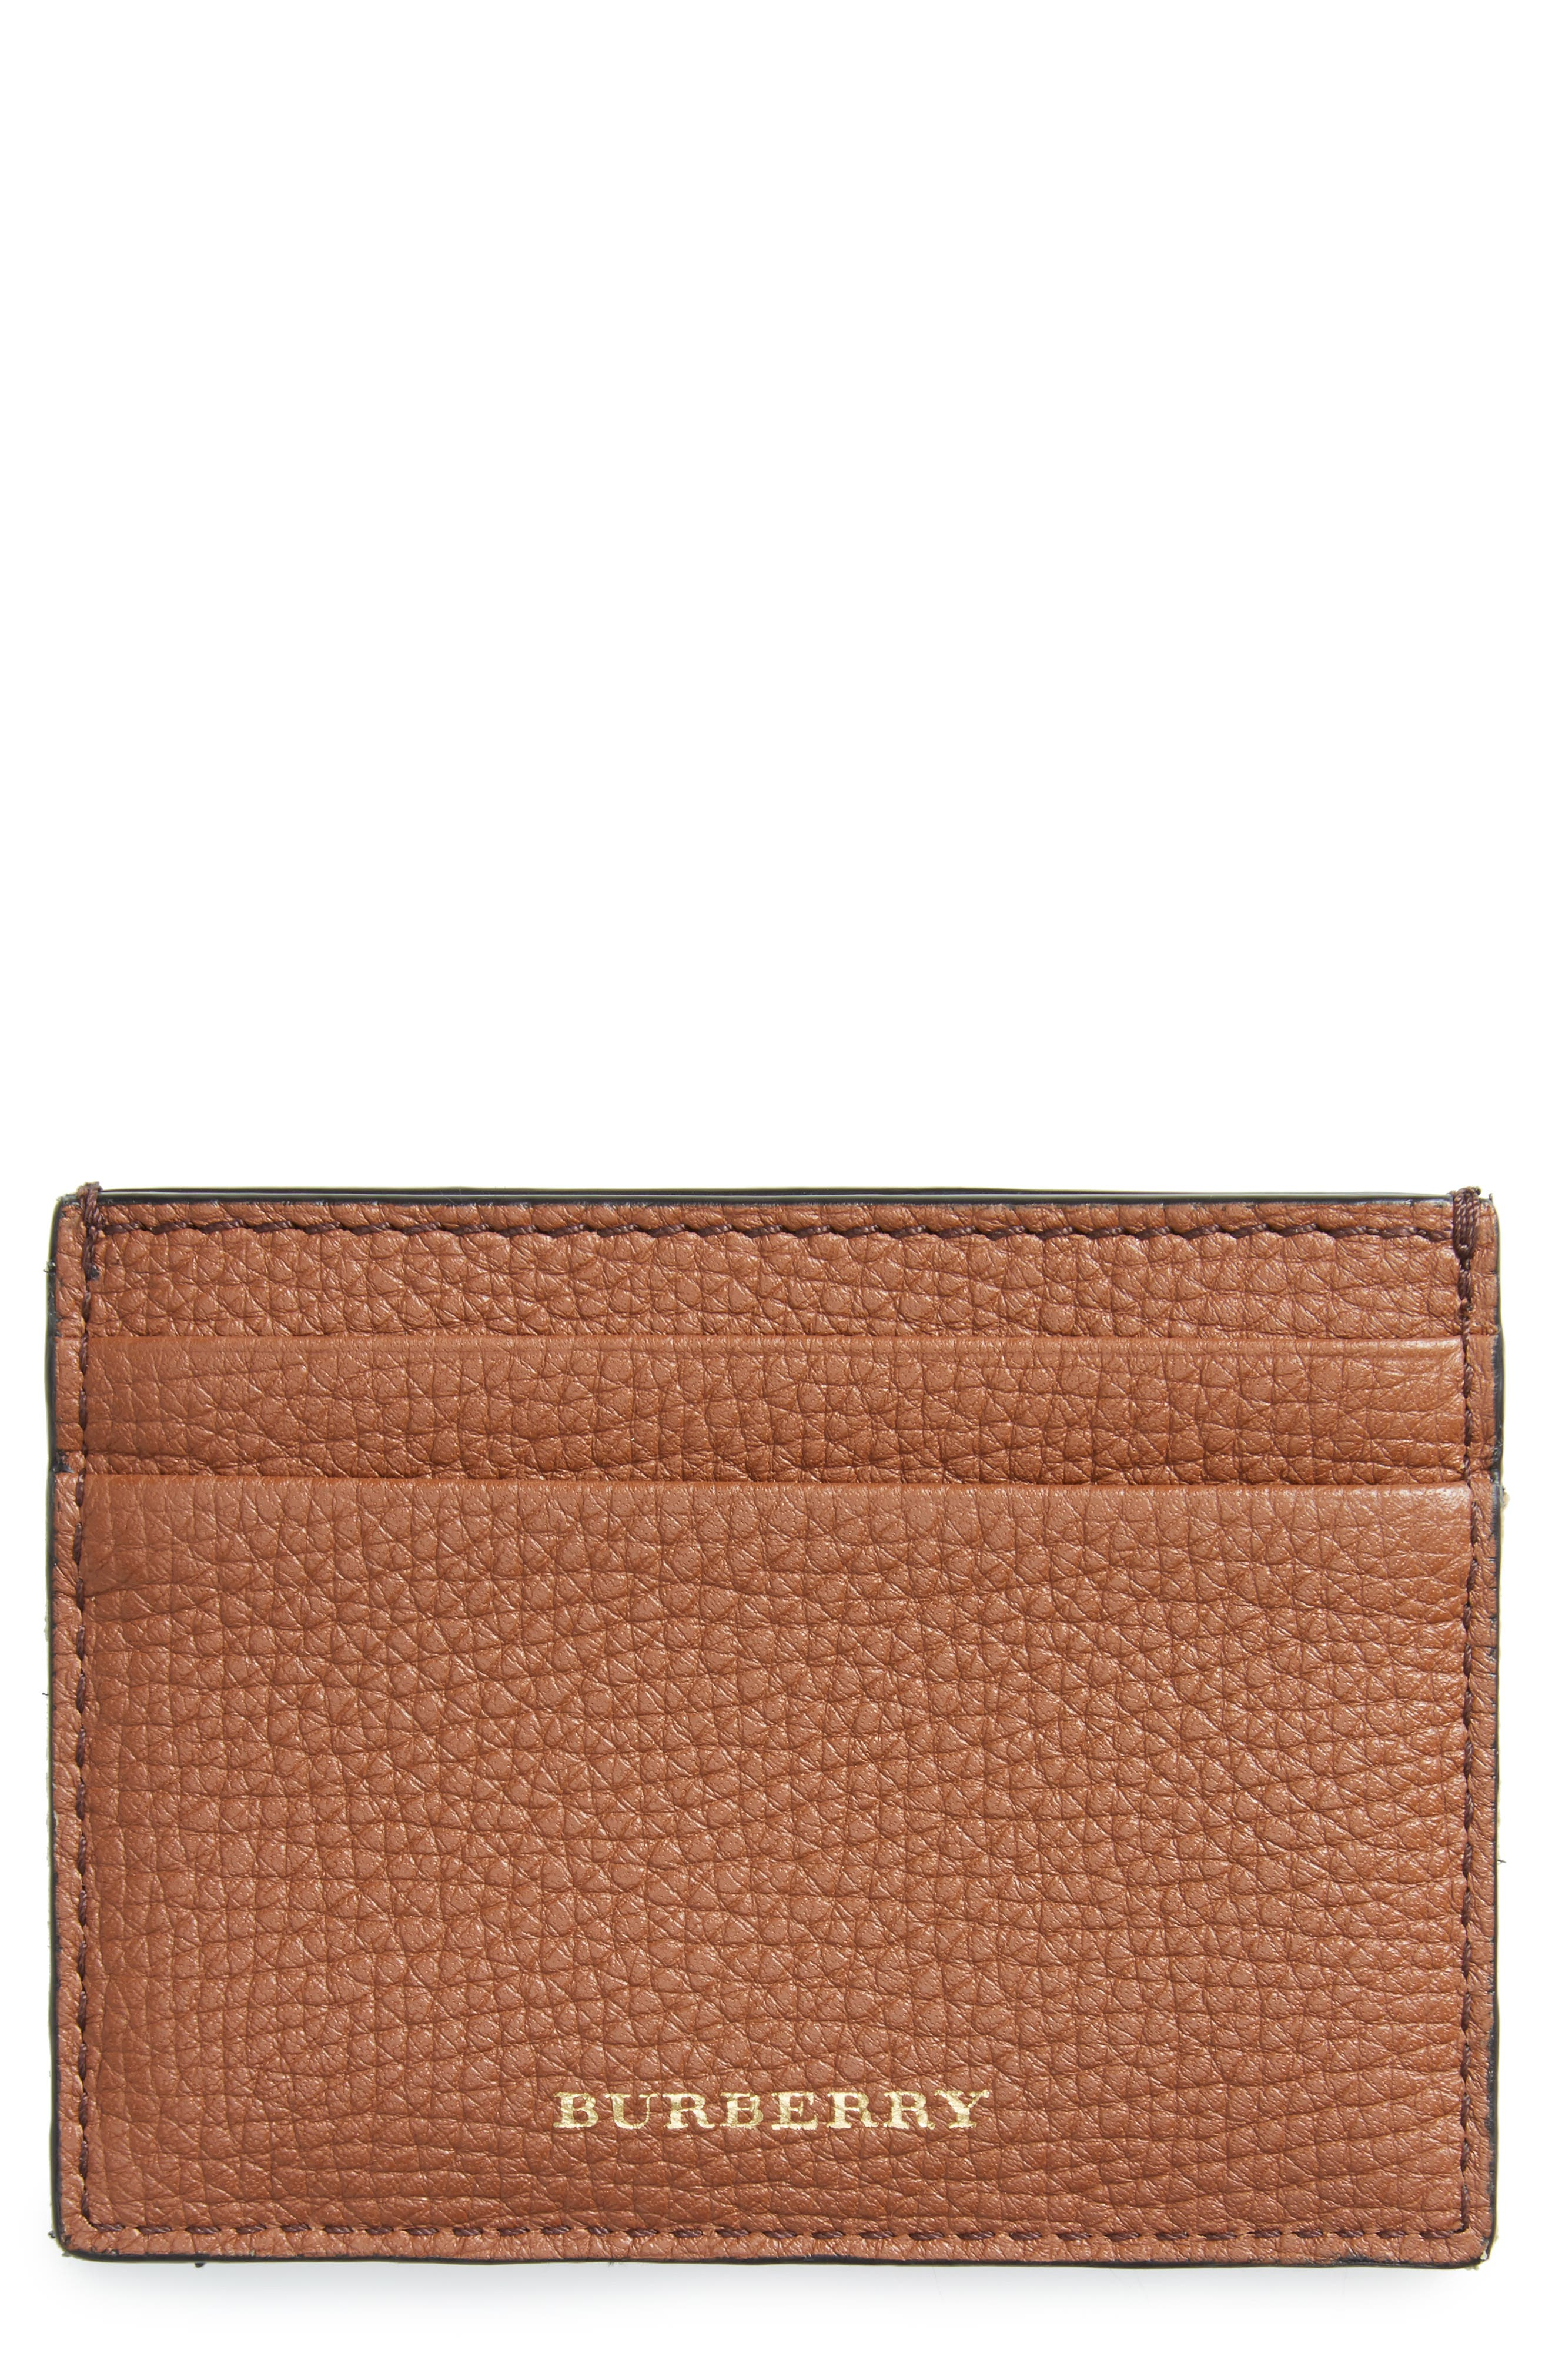 Alternate Image 1 Selected - Burberry Sandon Leather Card Case